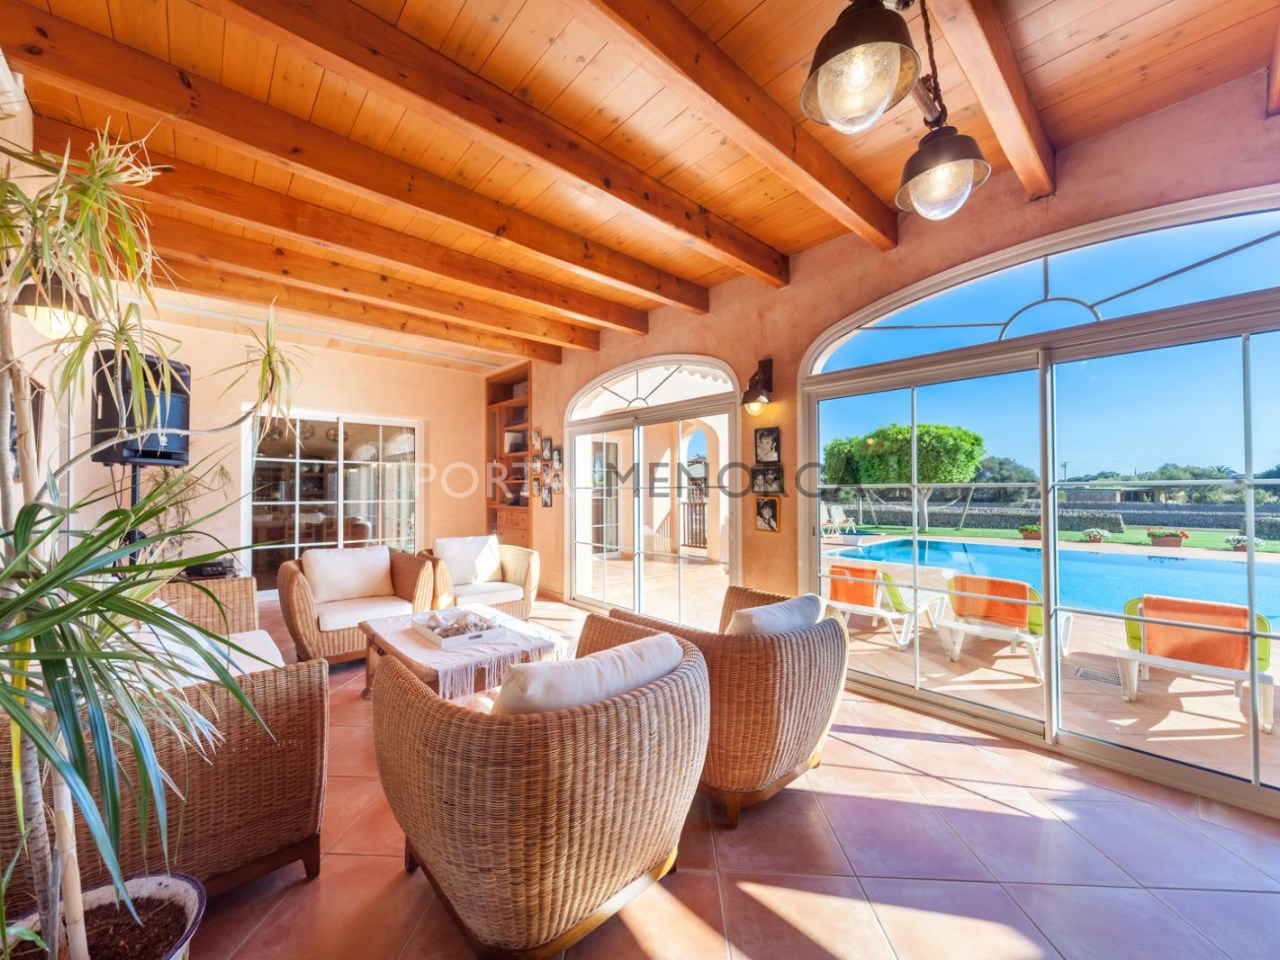 Casa de campo con piscina en Menorca (12 de 41)